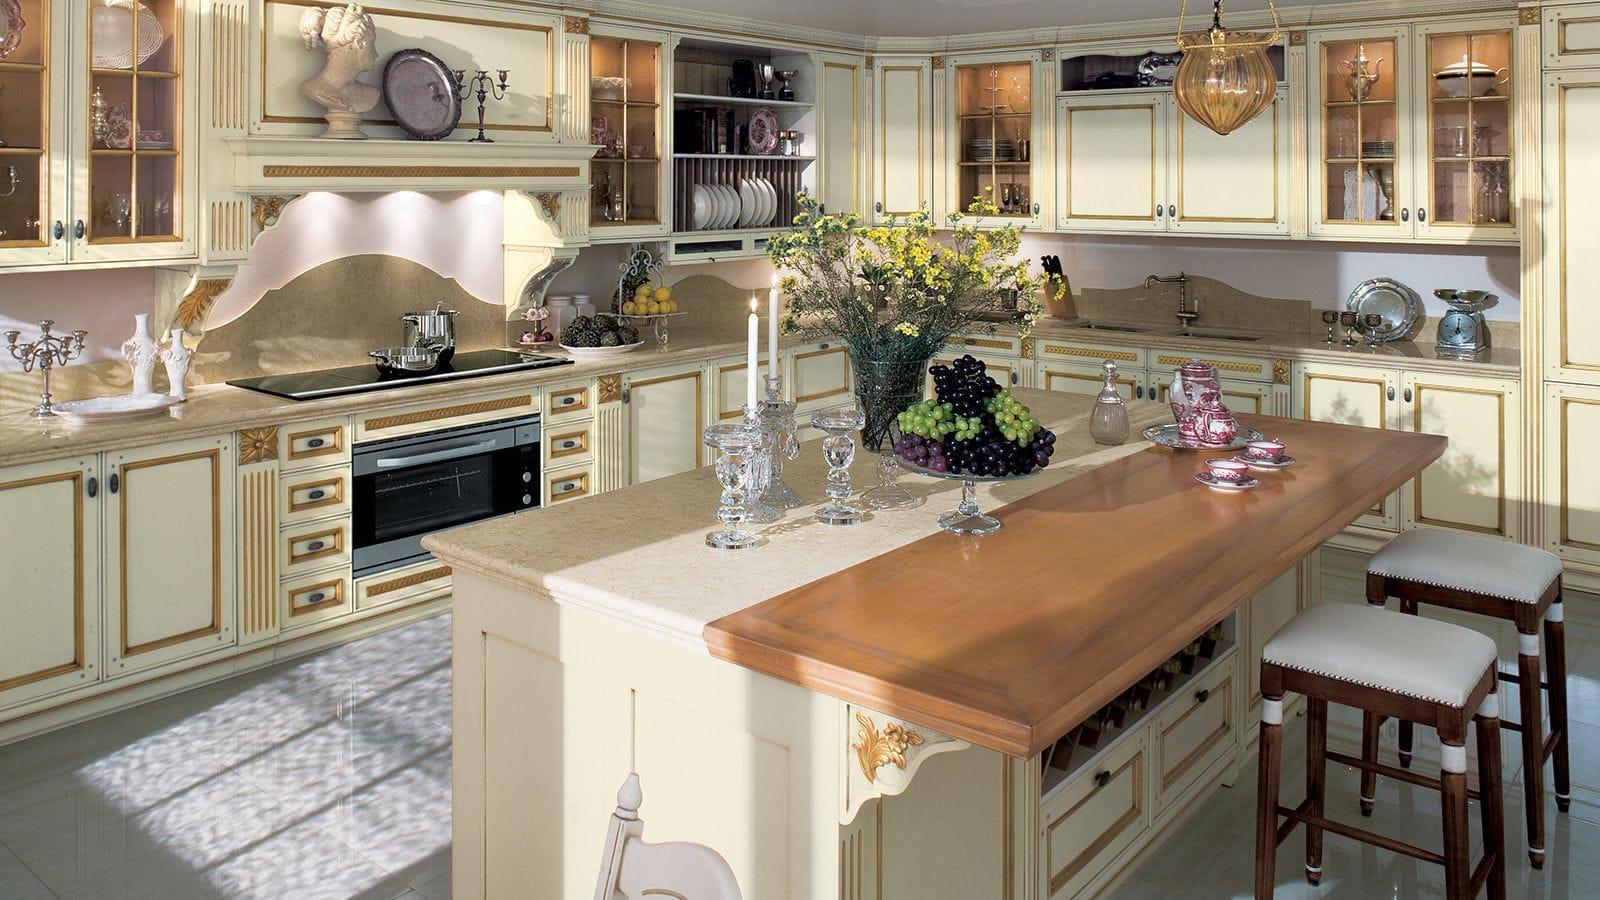 Mueble Alto Para Cocina Fortuna Gold By Luciano Dal Bello Gd  # Muebles Luciano